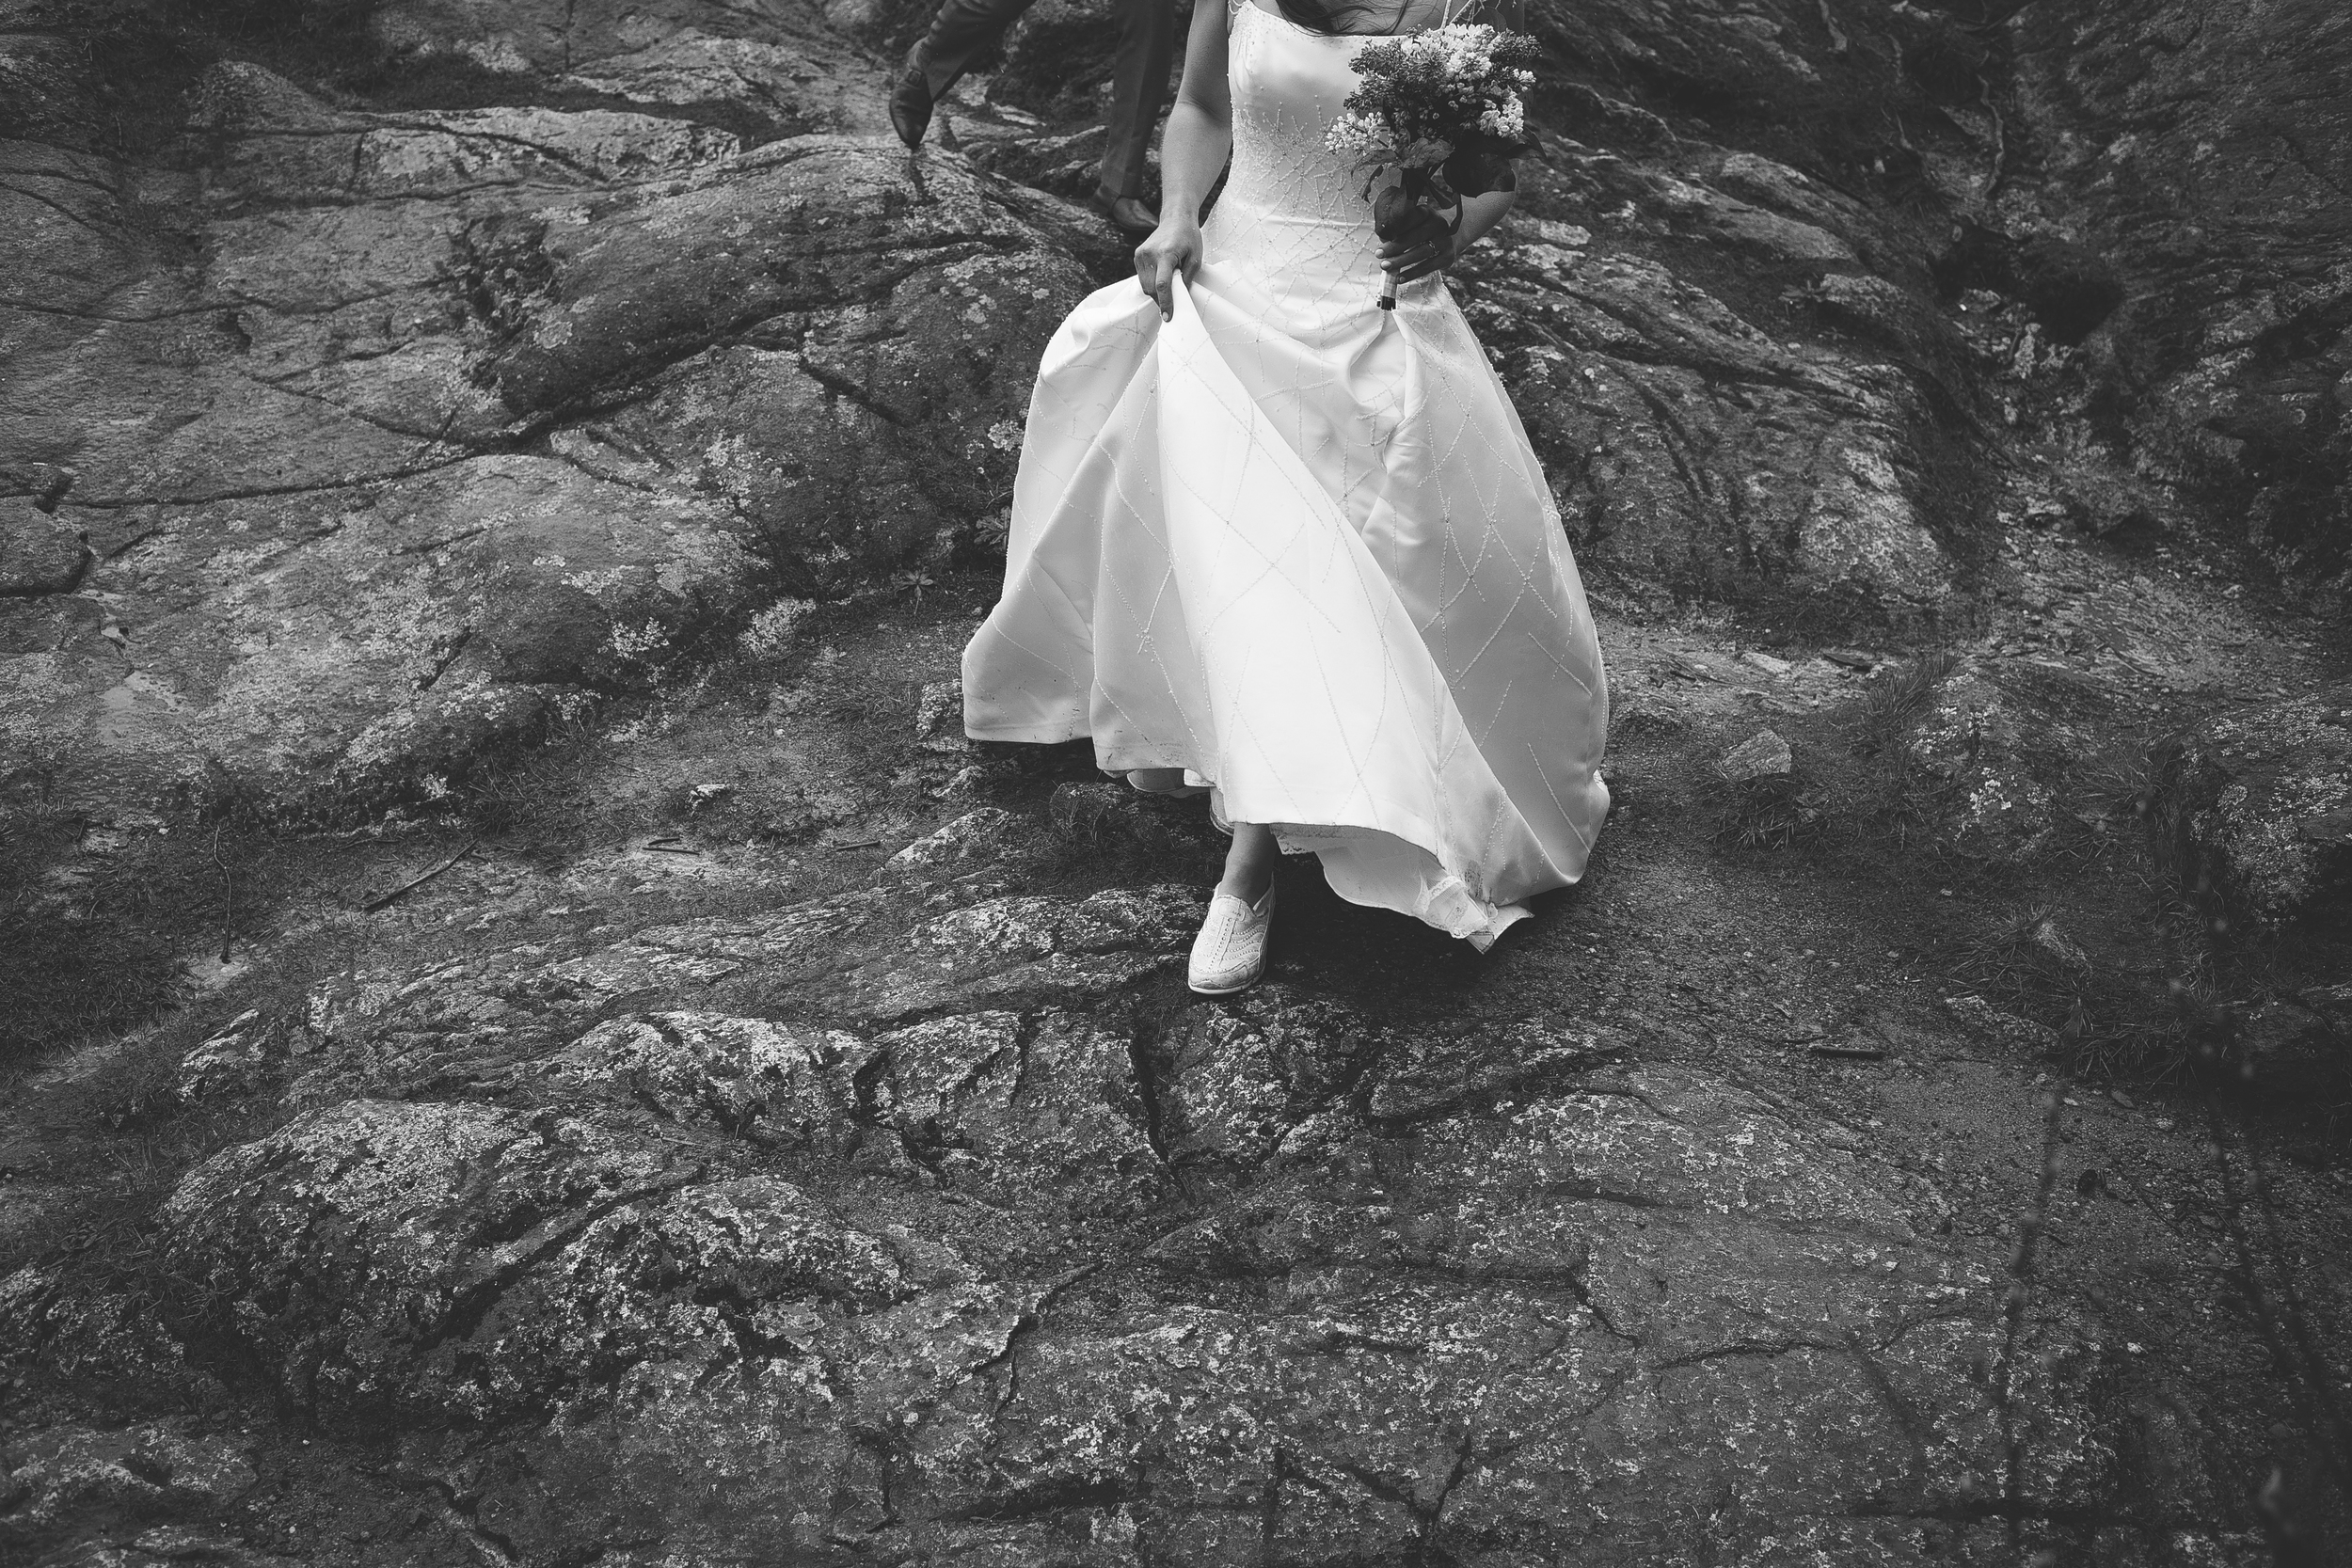 vancouver_photographer_wedding_DogwoodPhotography-12.jpg